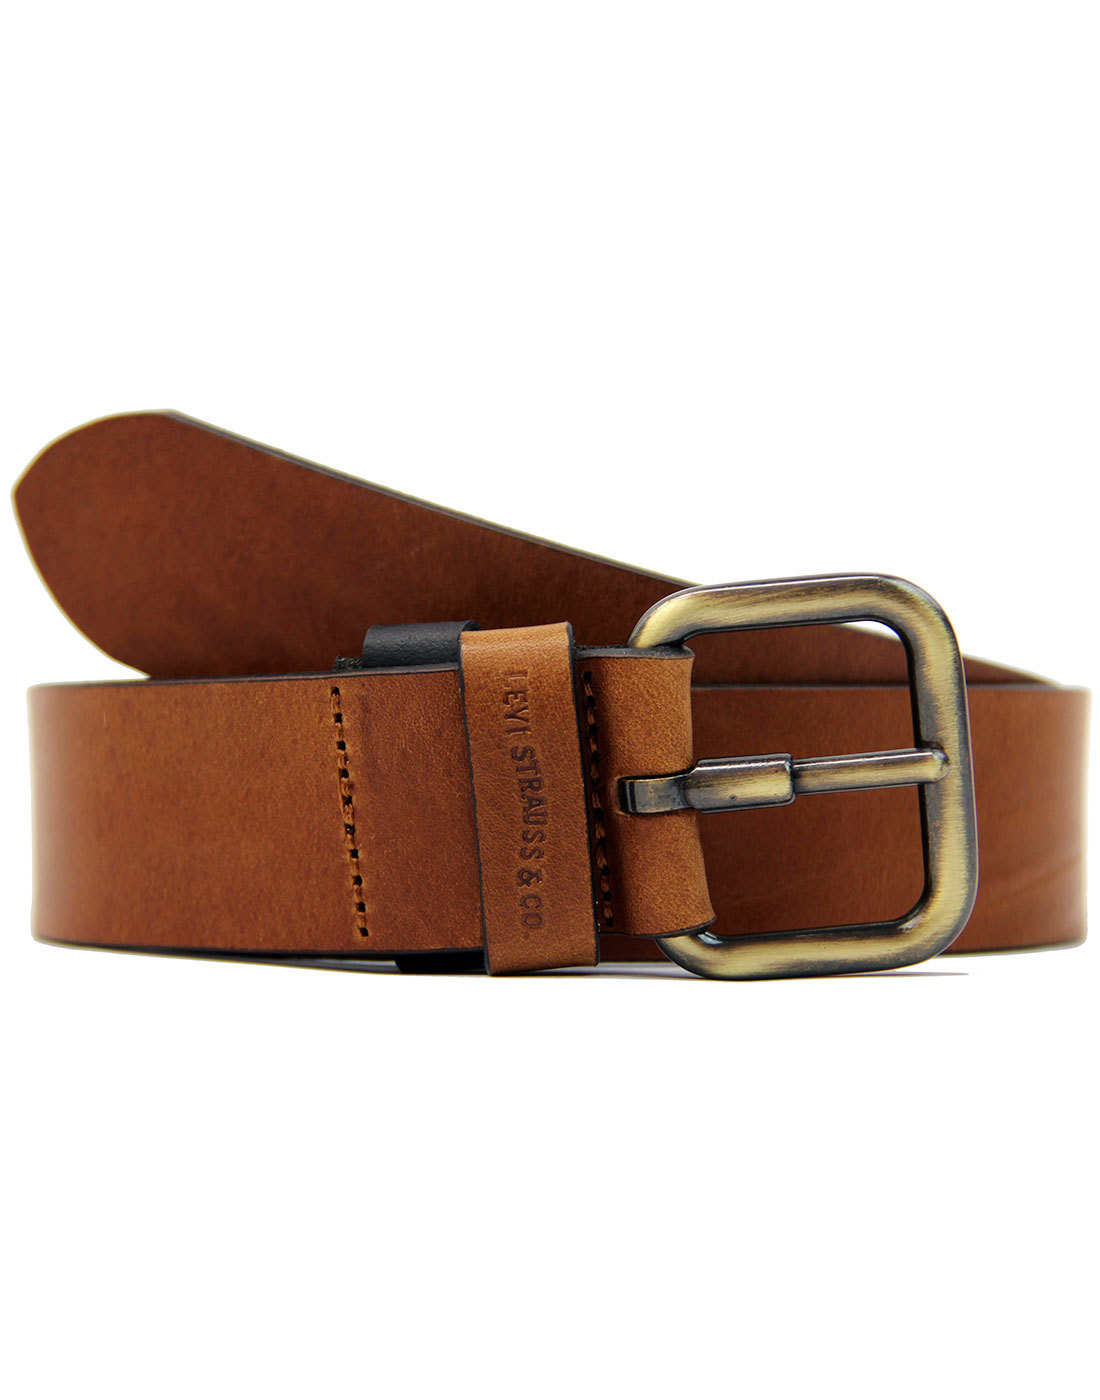 LEVI'S® Retro Sixties Seasonal Reversible Belt